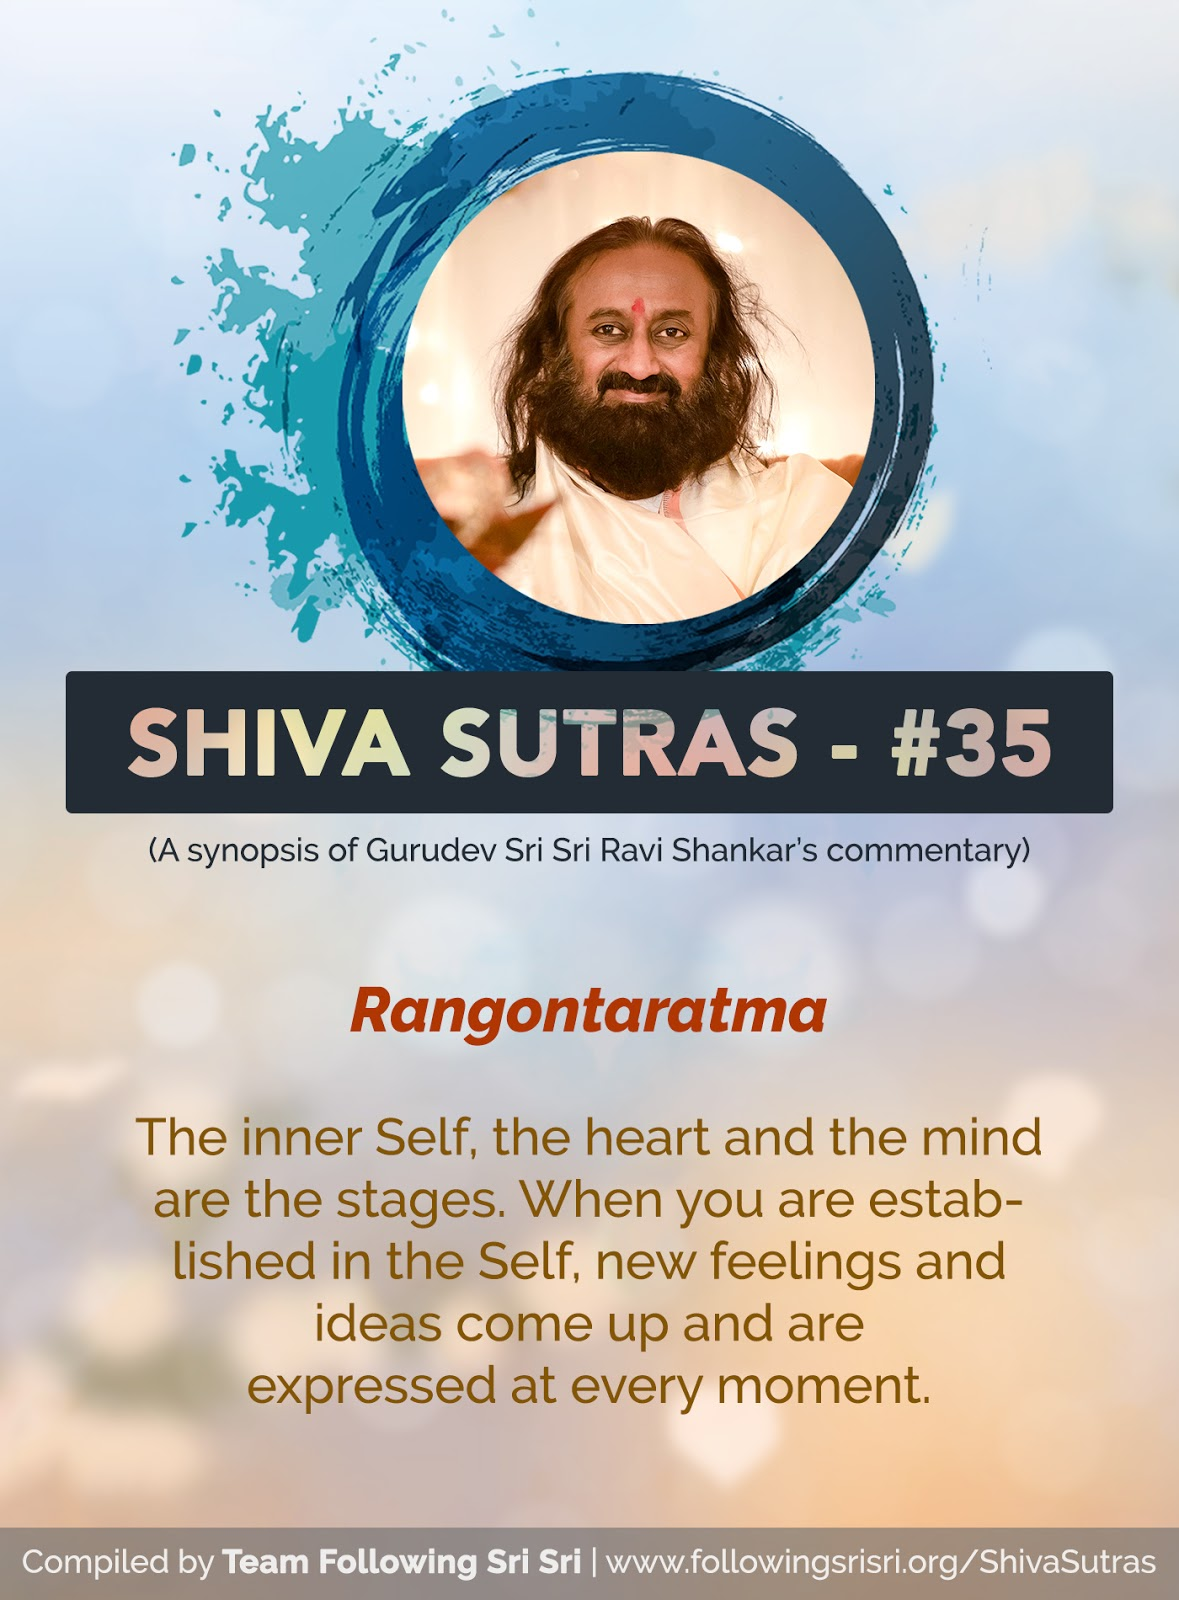 Shiva Sutras - Sutra 35